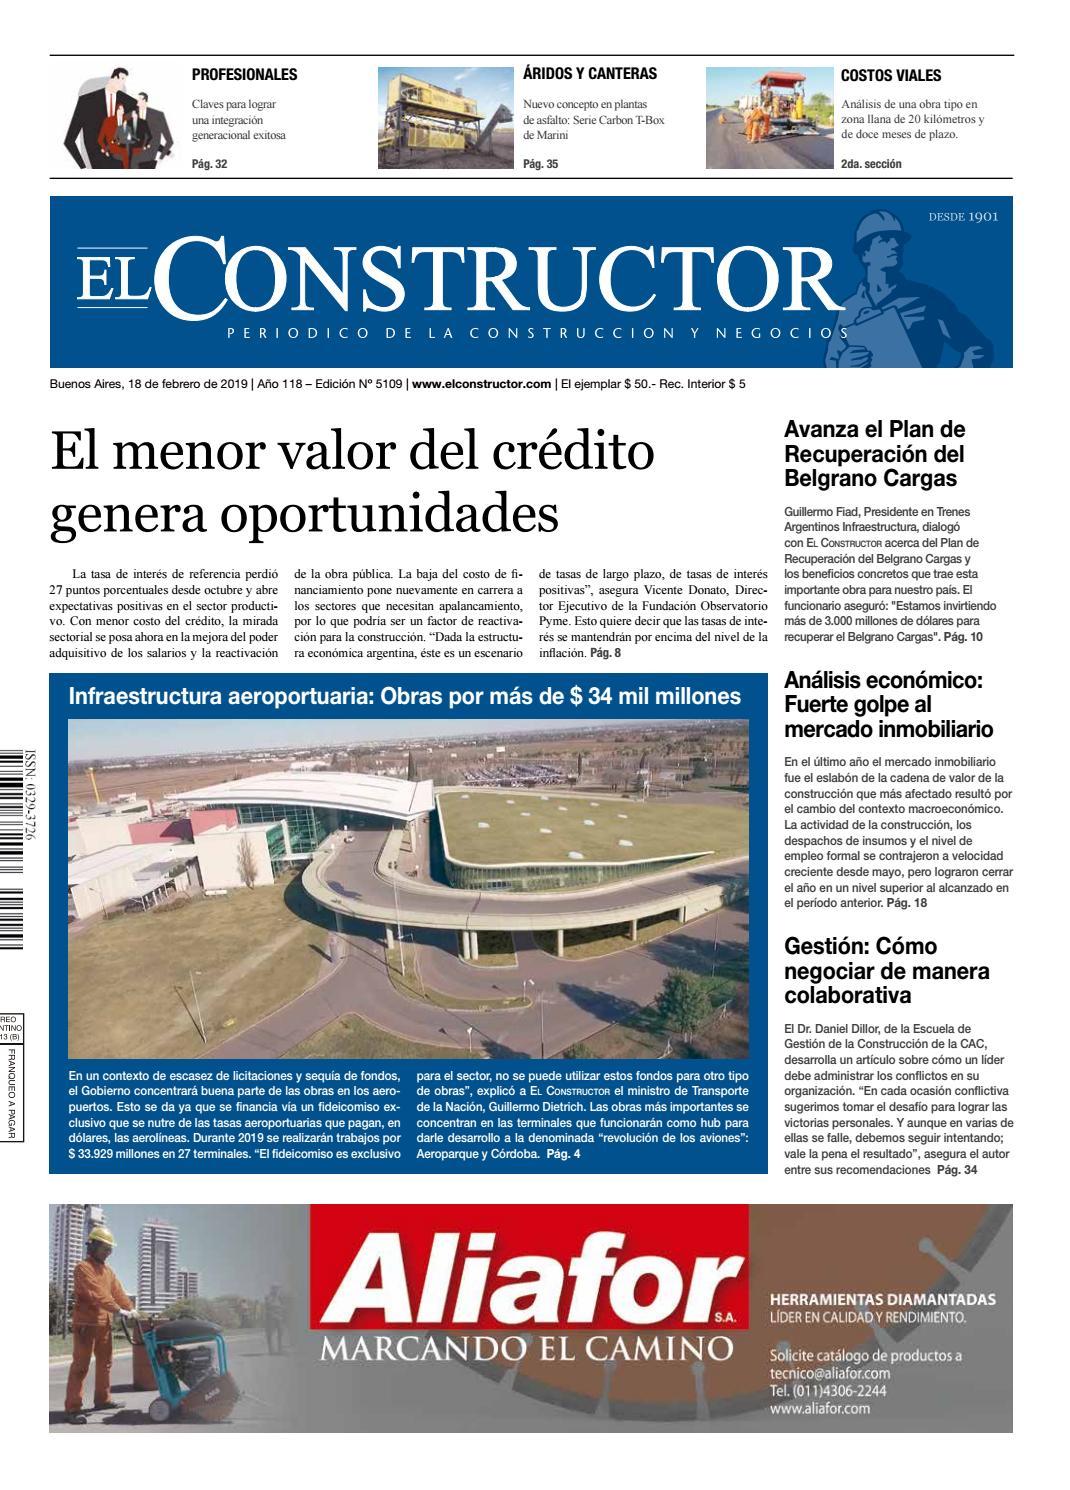 d48855f43 El Constructor 18/02/2019 - N° 5109 Año 118 by ELCO Editores - issuu